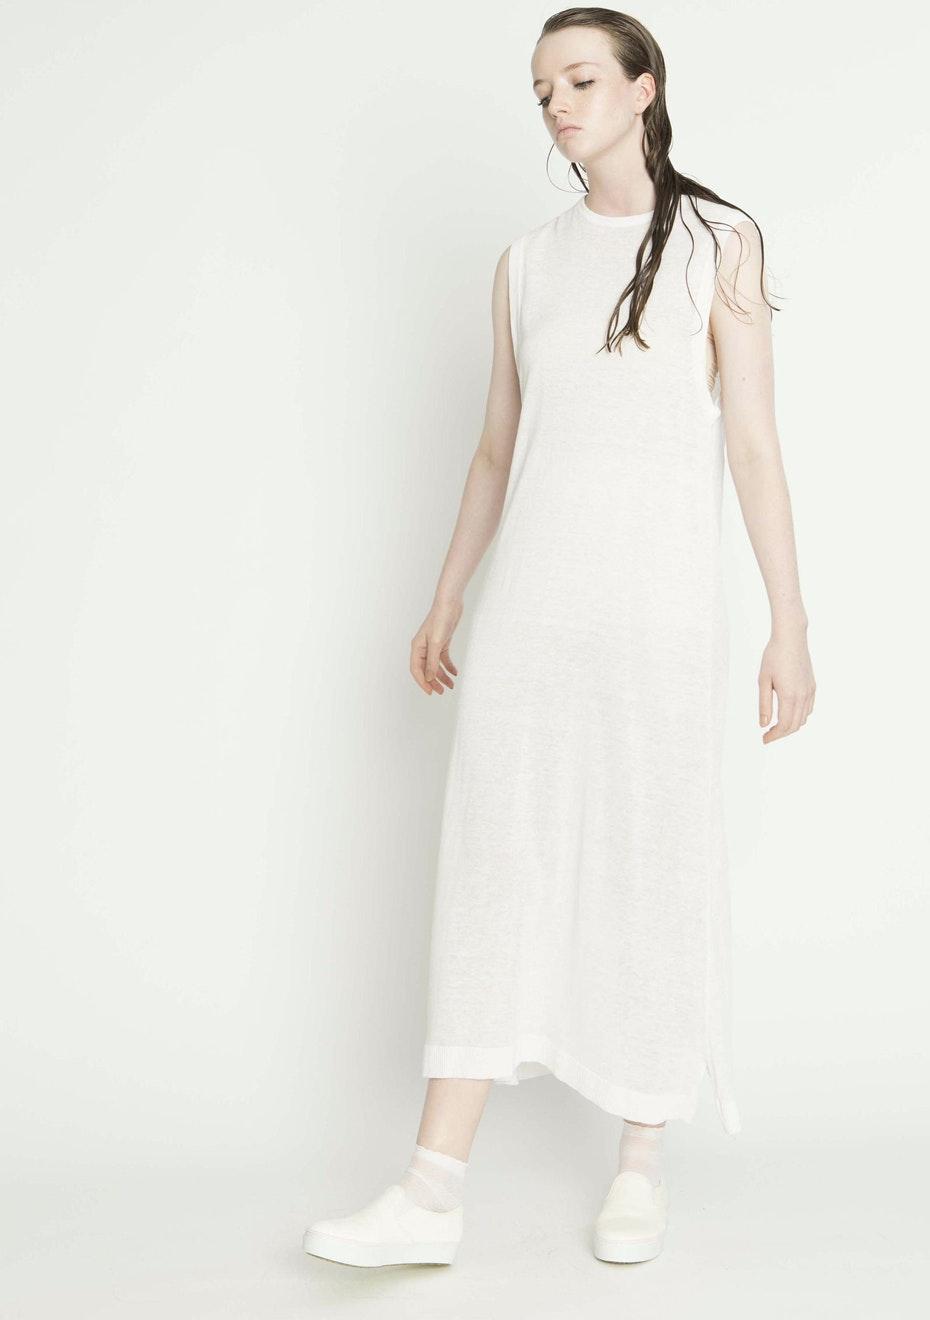 Salasai - RELAX TANK DRESS - WHITE